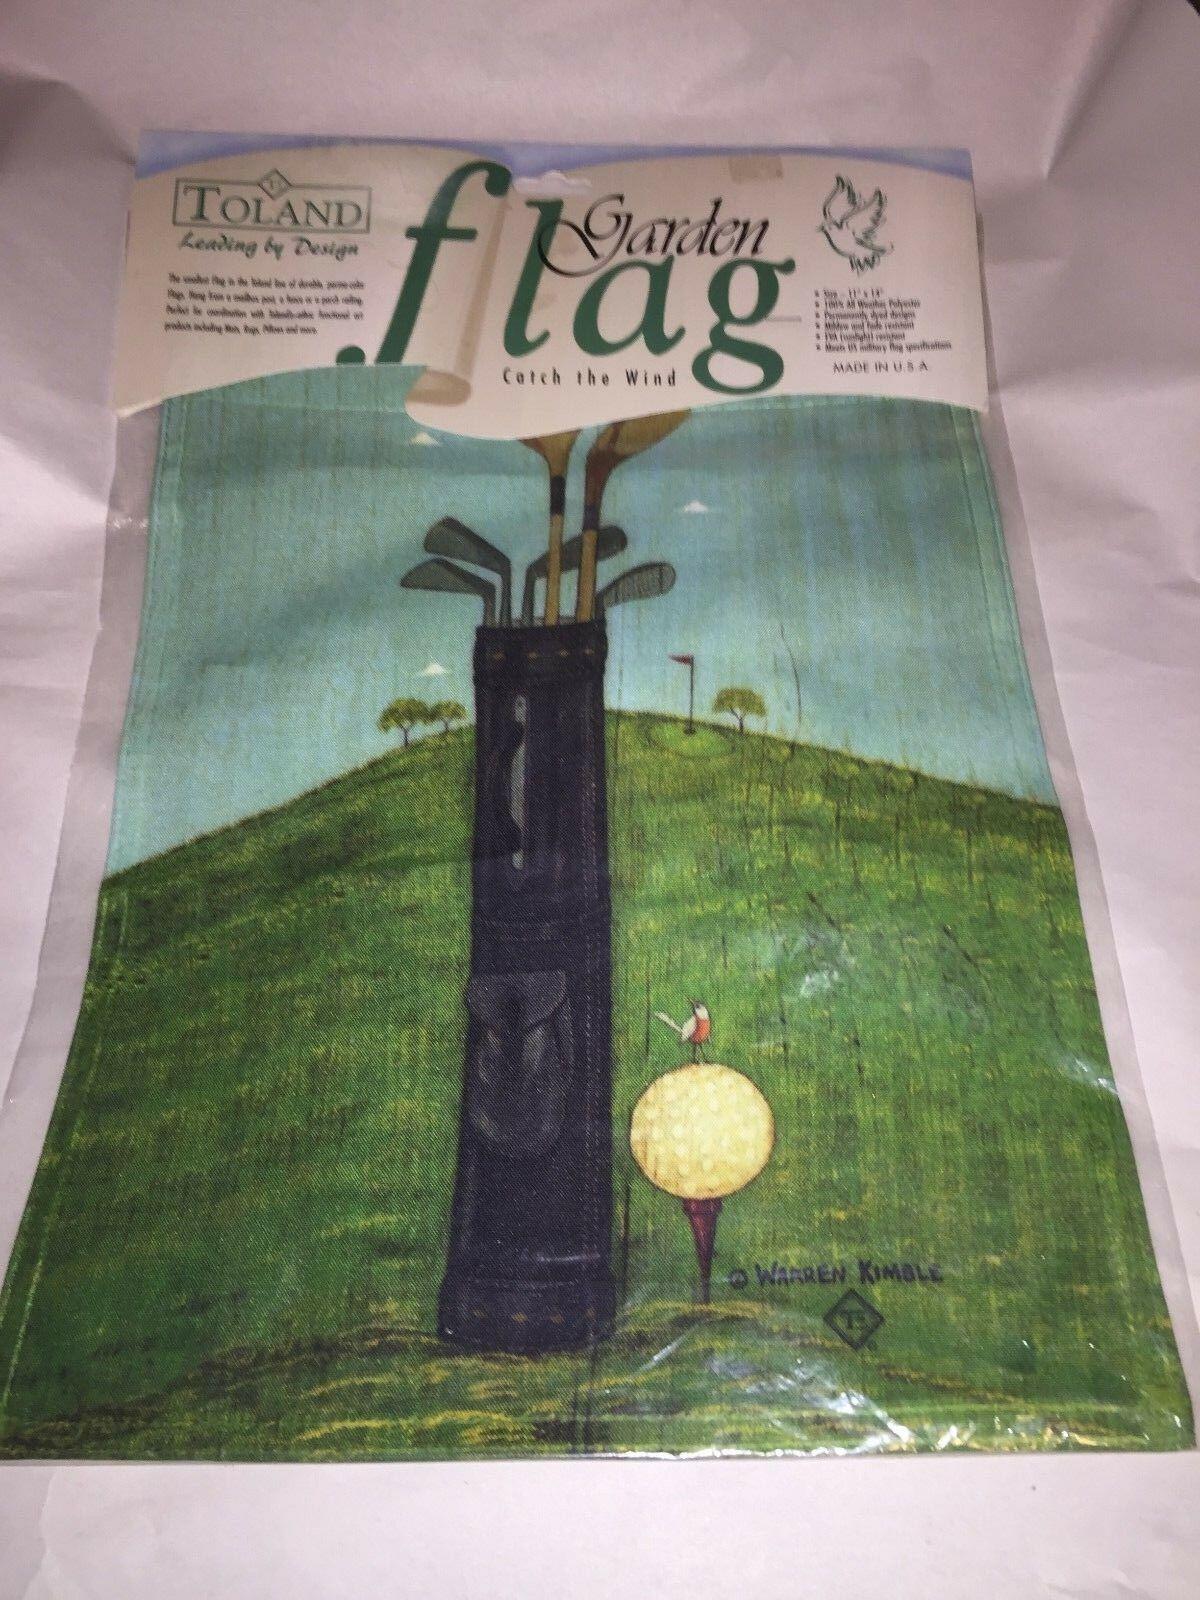 Toland Brand CATCH THE WIND GARDEN FLAG, 11X14, Golf Flag     cc - $9.49